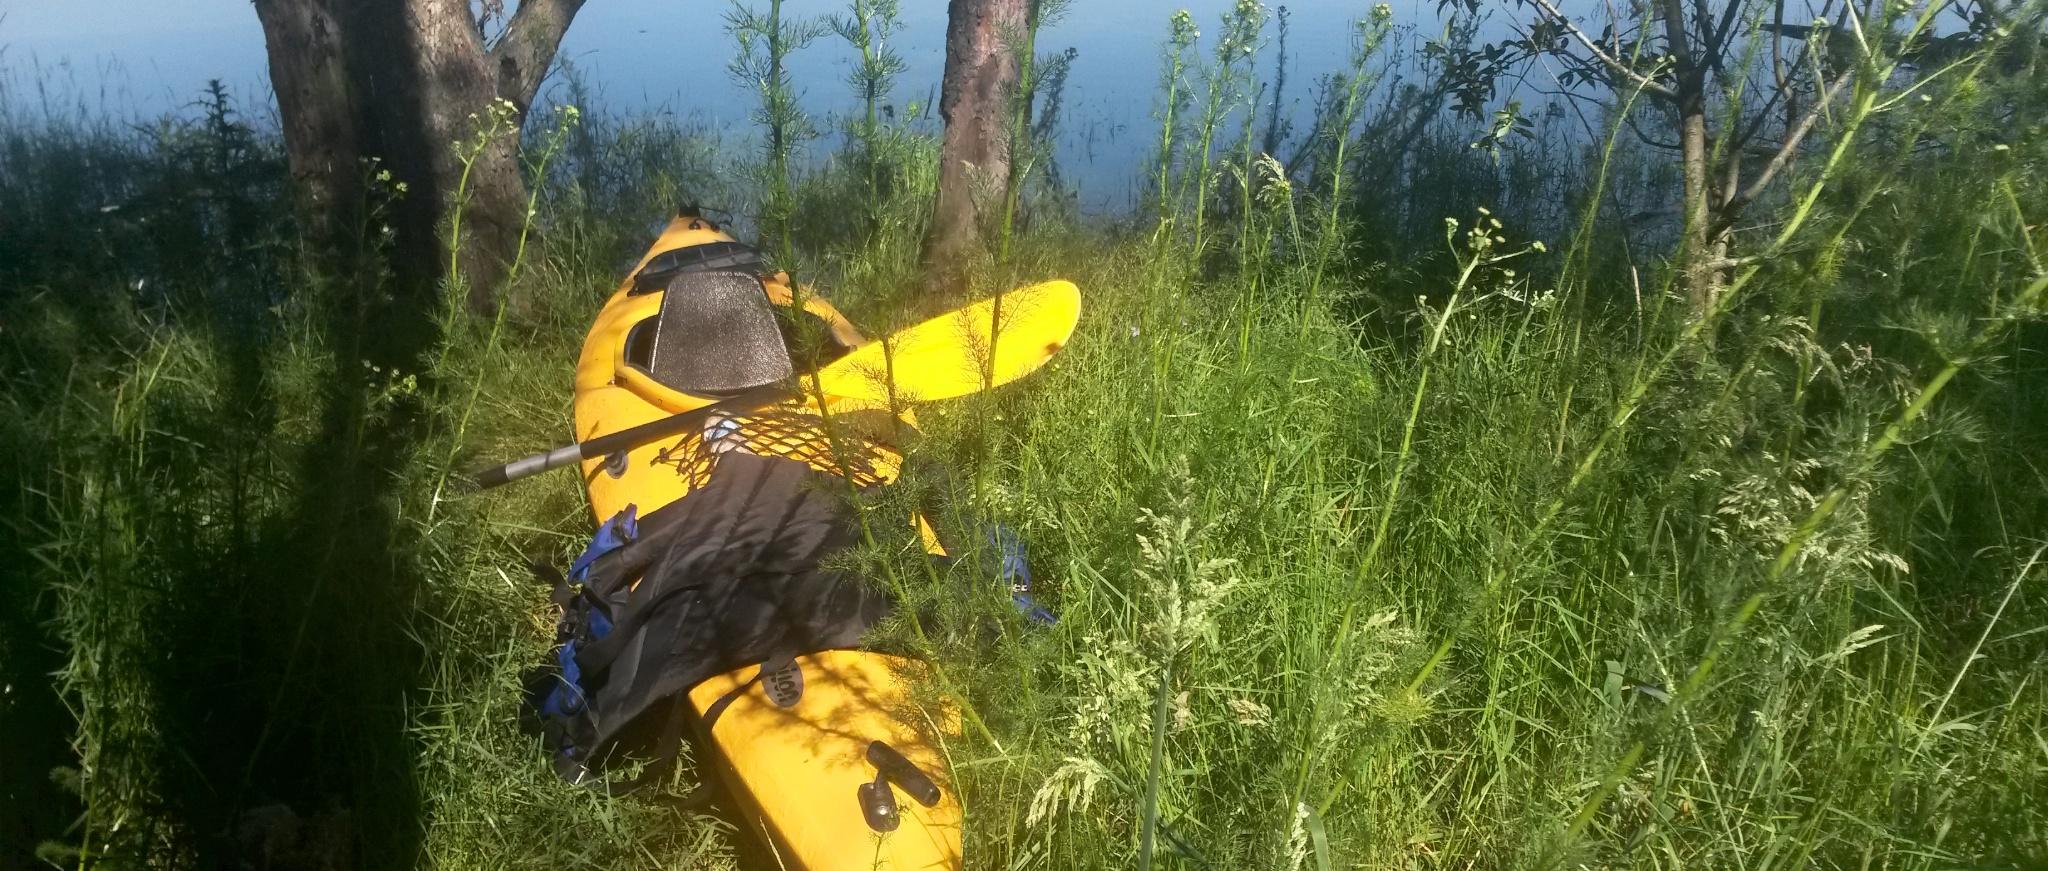 Georgi's kayak